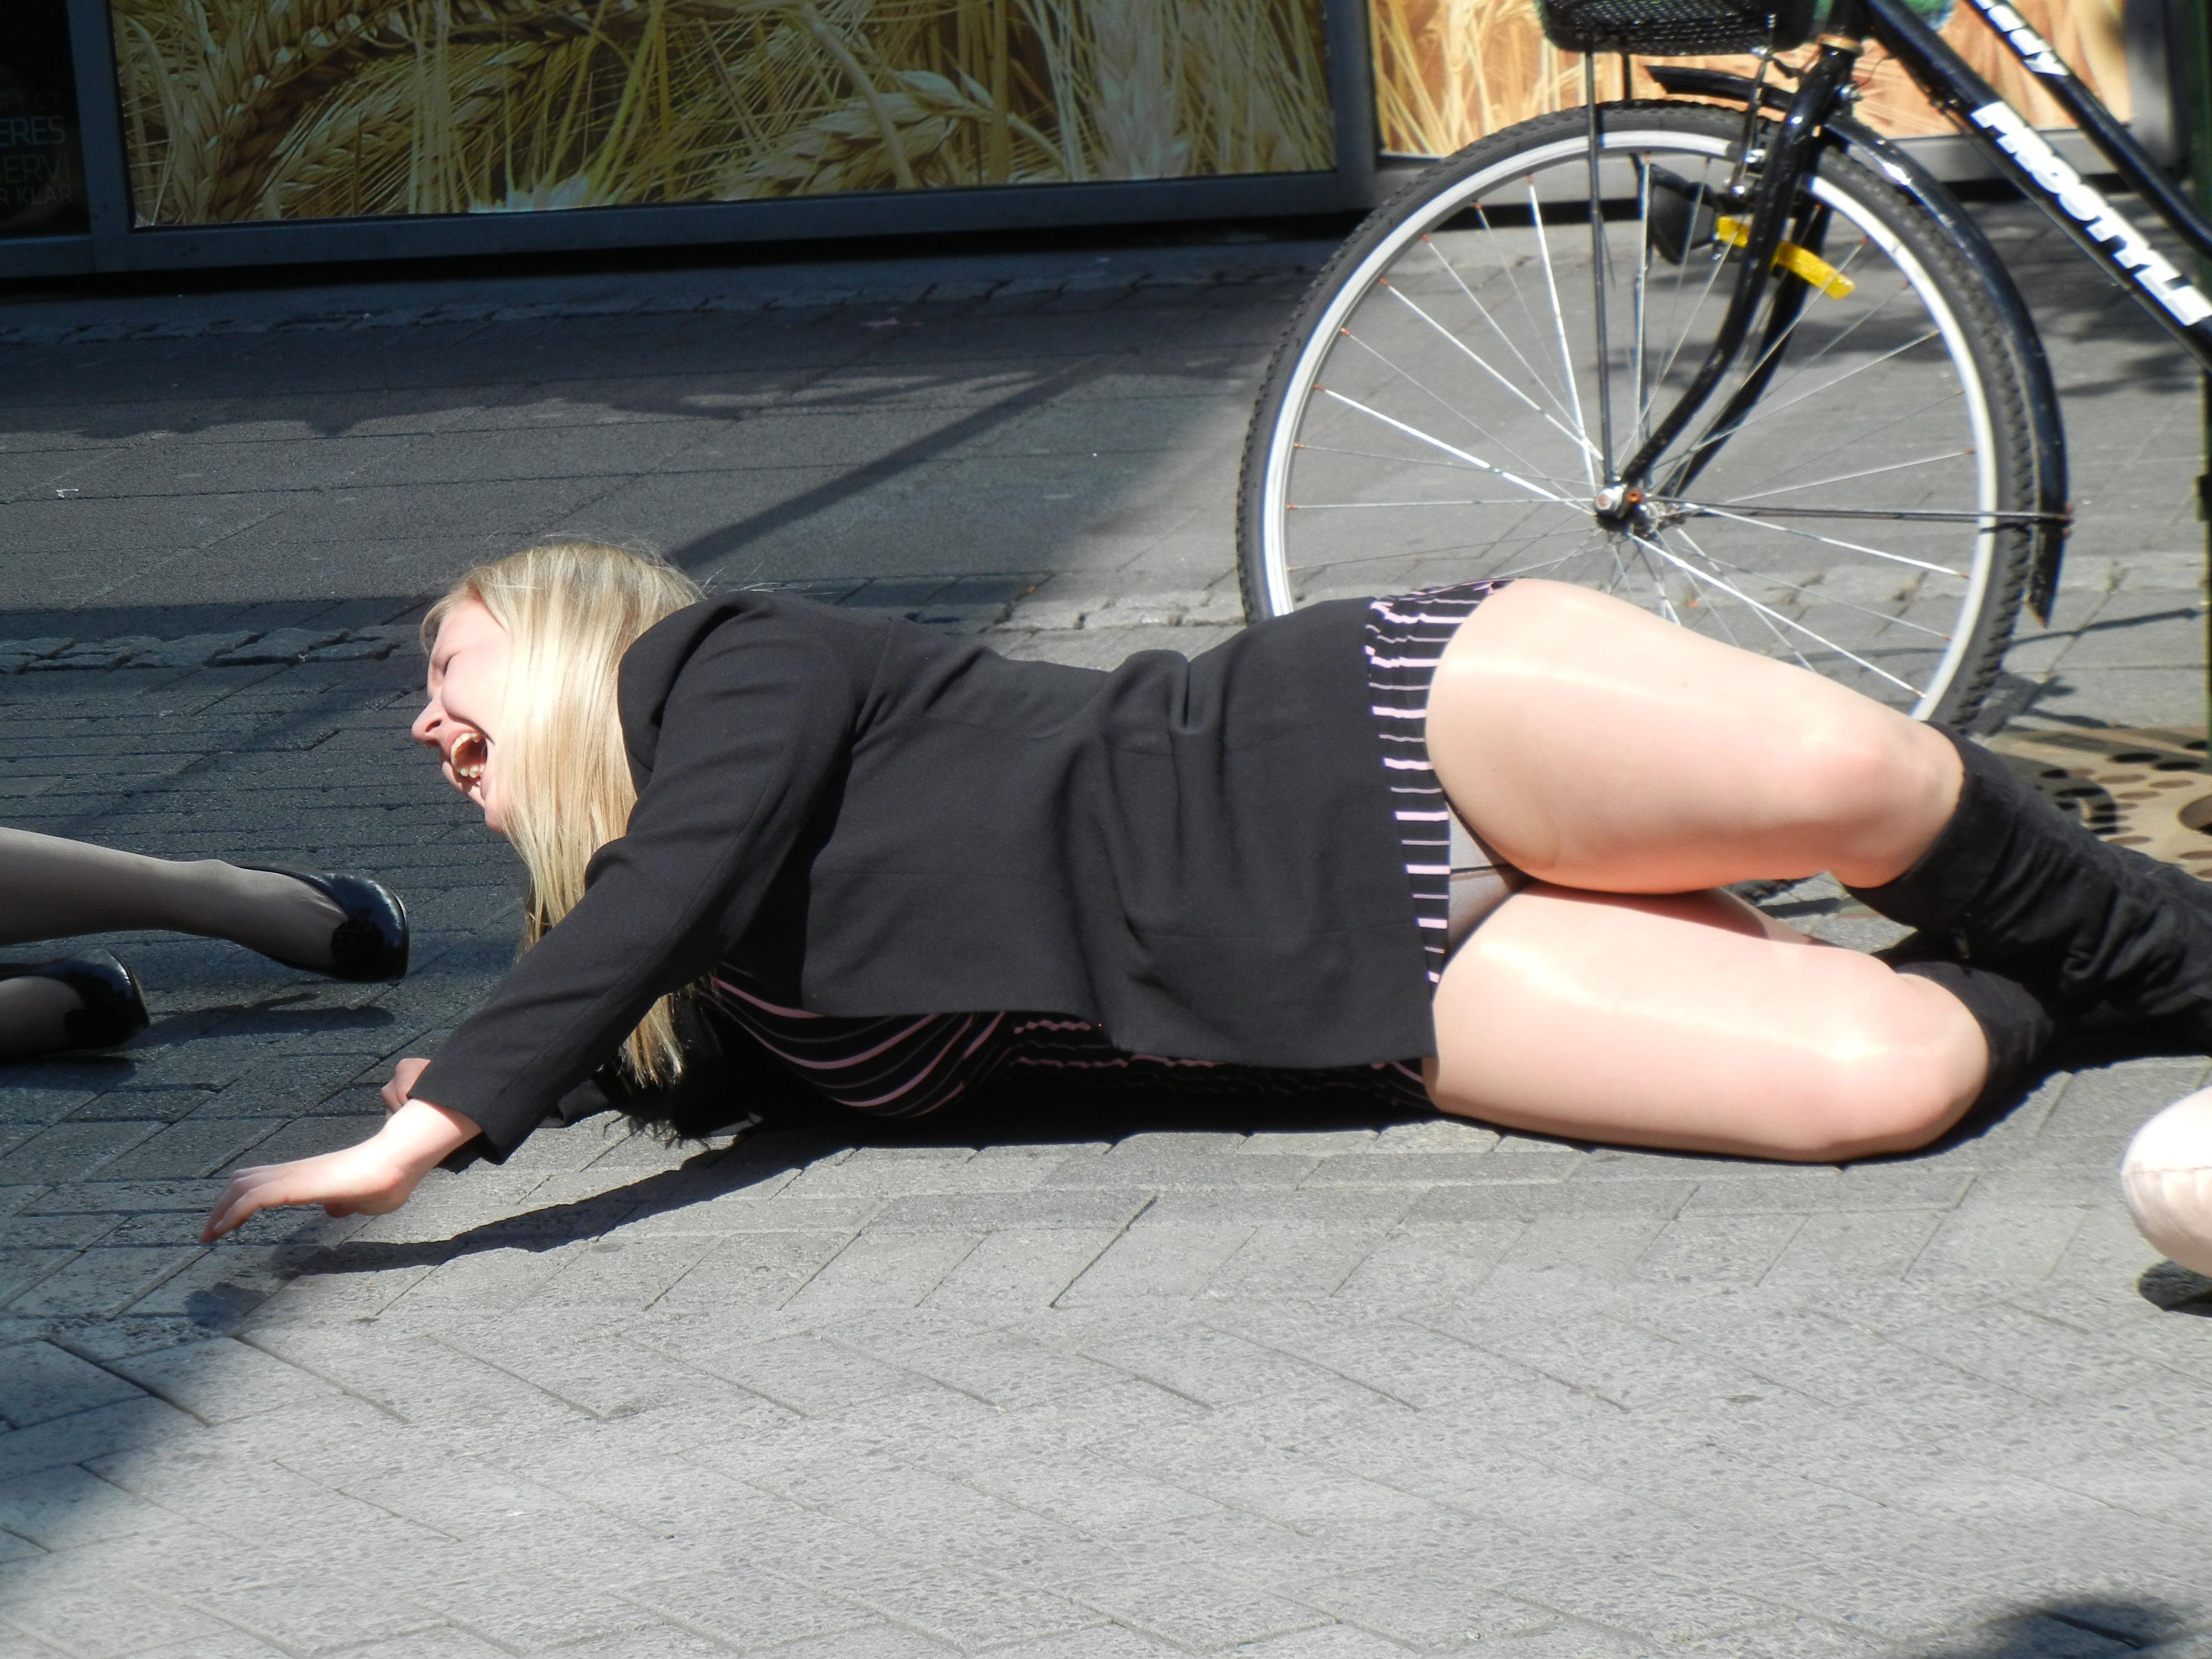 woman skirt: